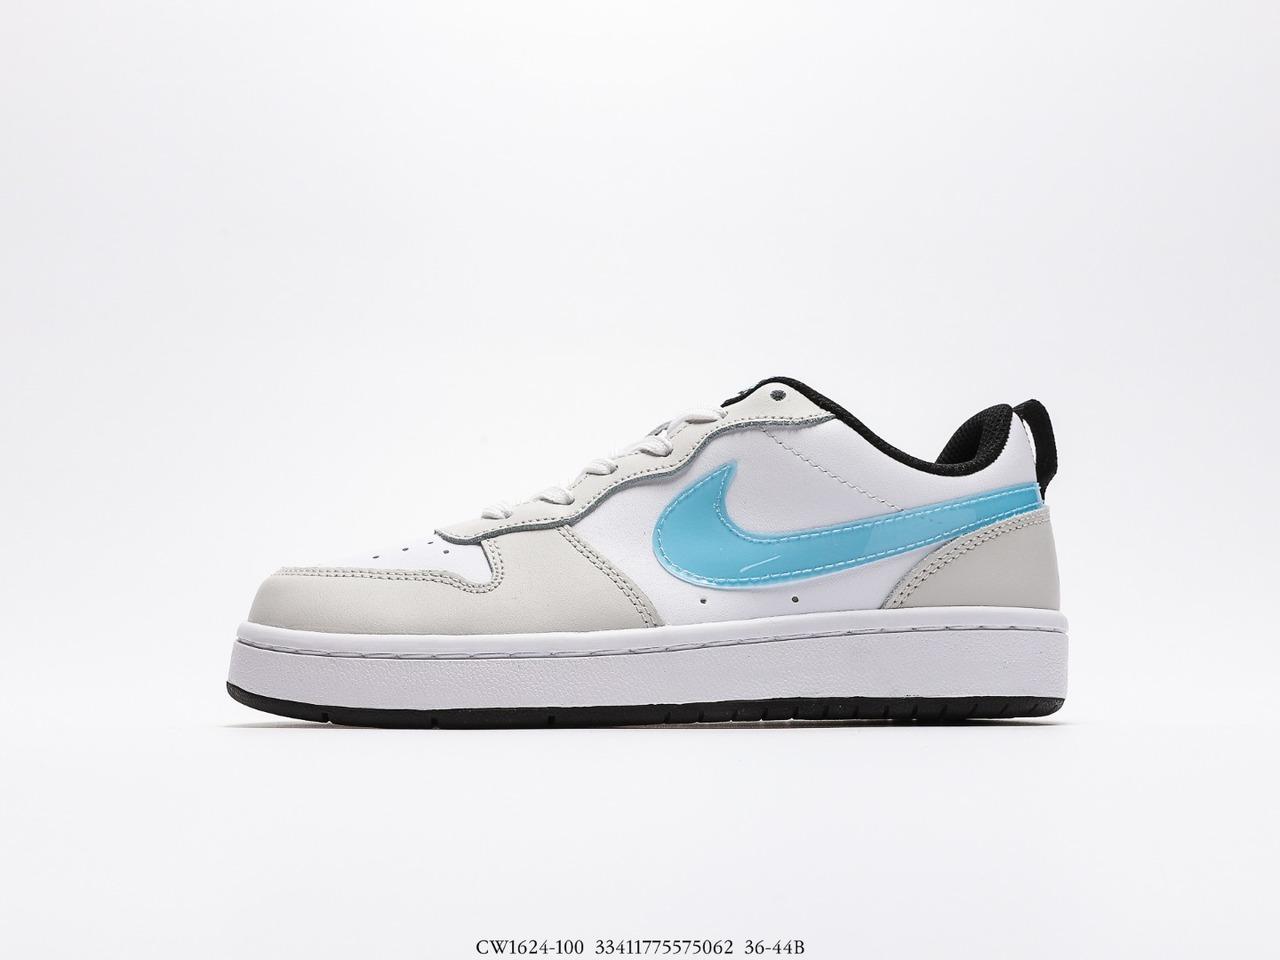 2021 Nike Court Borough Low 2 grey blue white sneakers